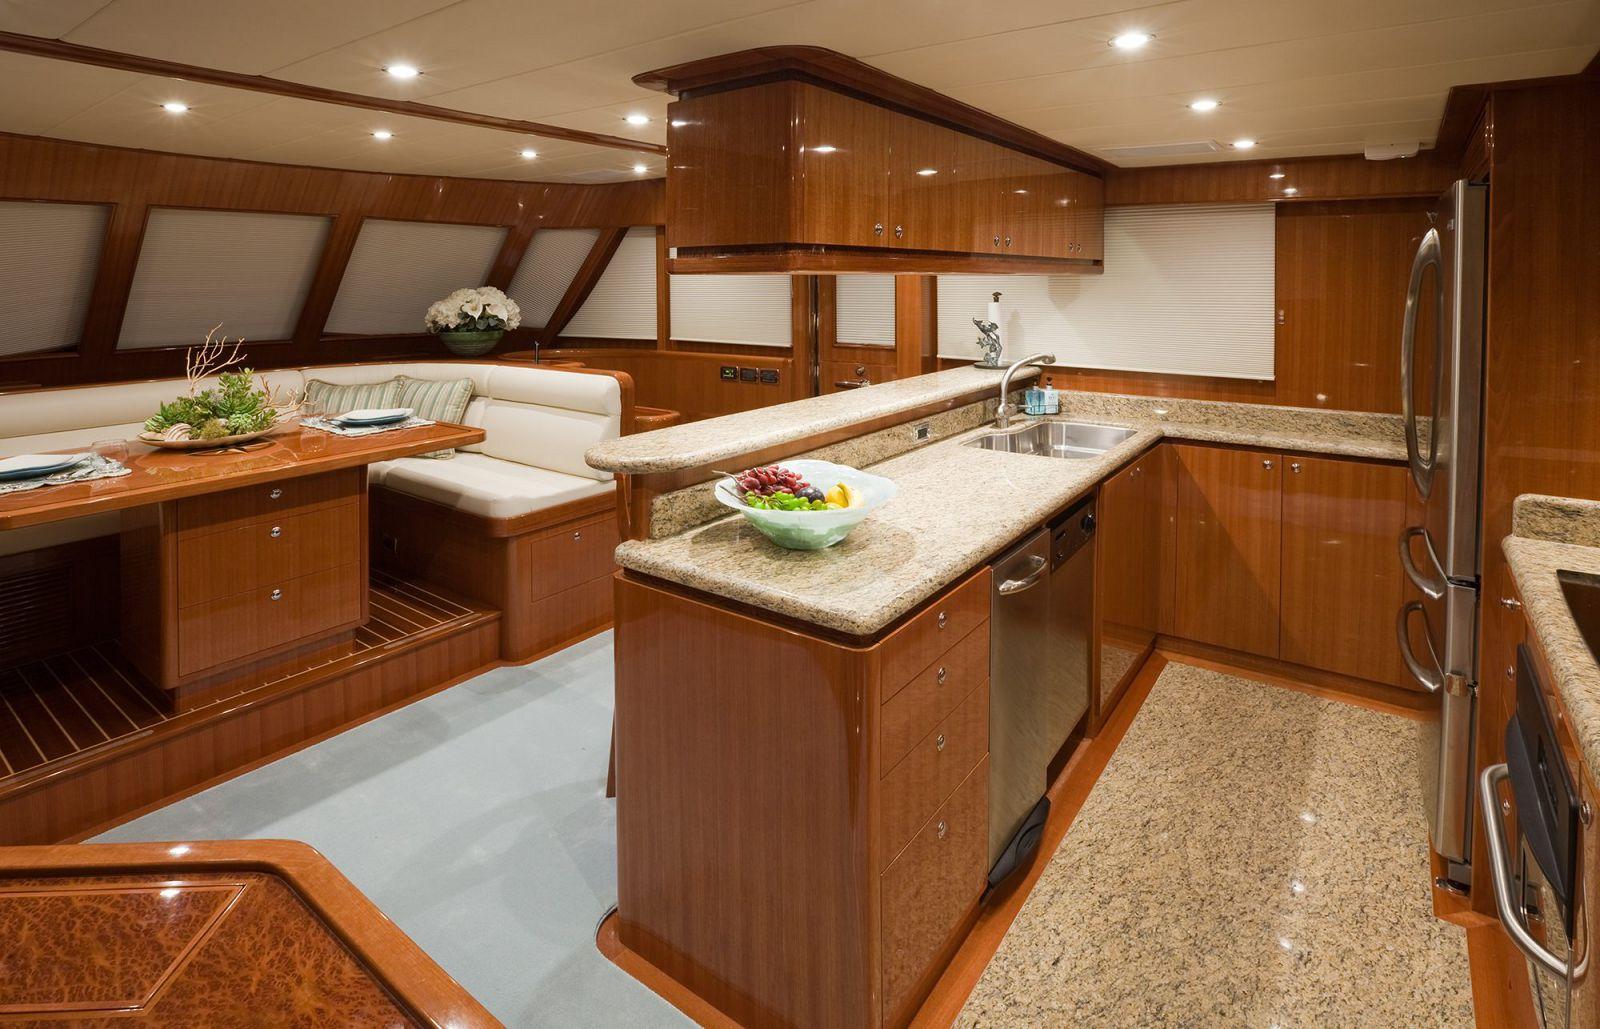 Galley - Endurance 600 Yacht